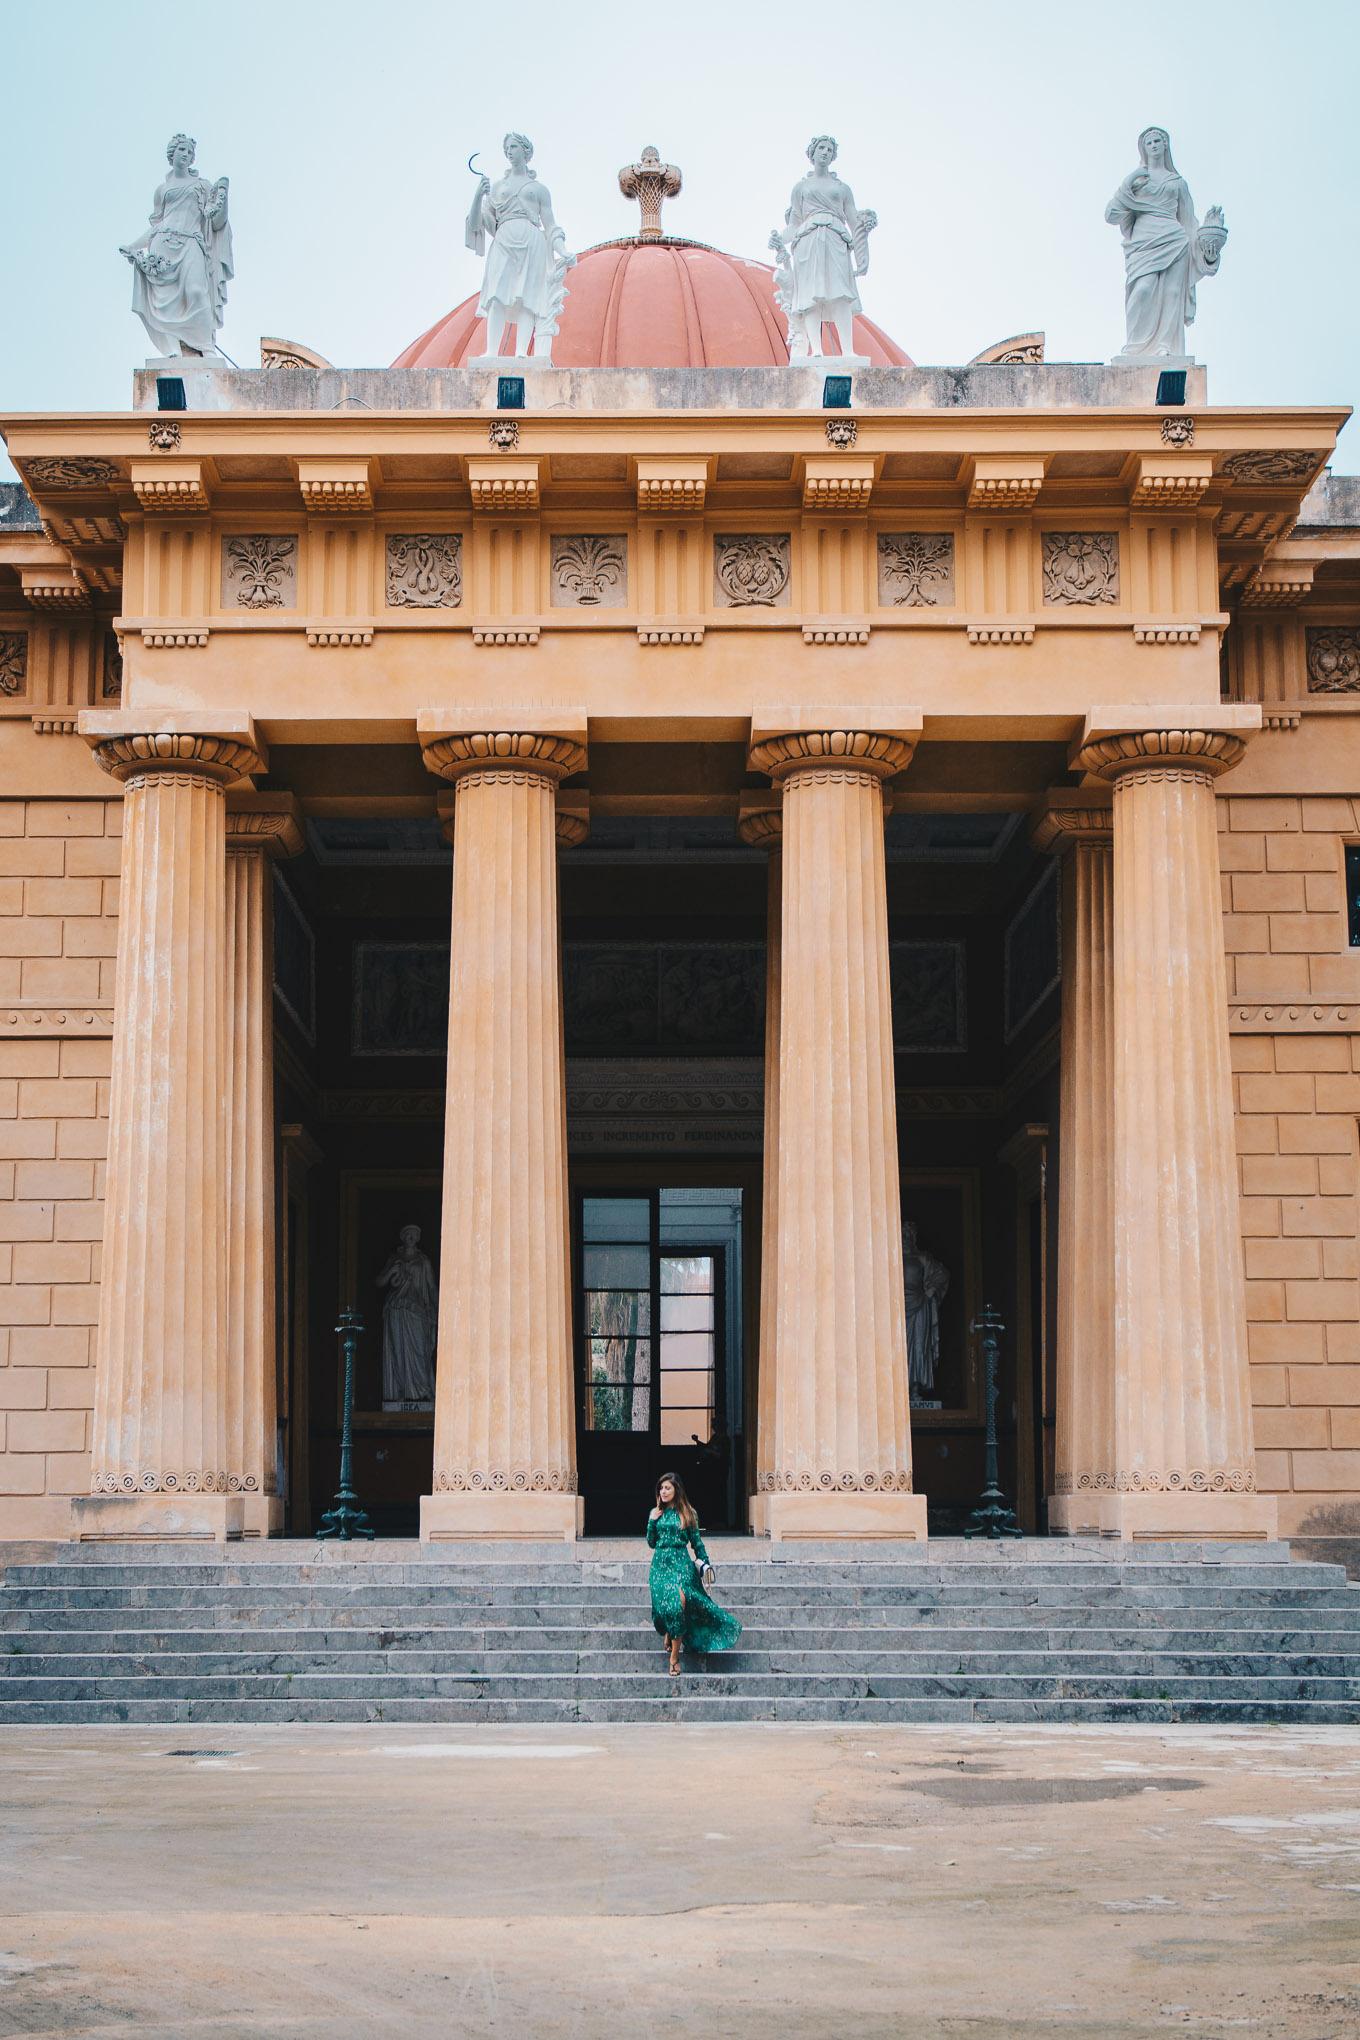 Orto botanico temple